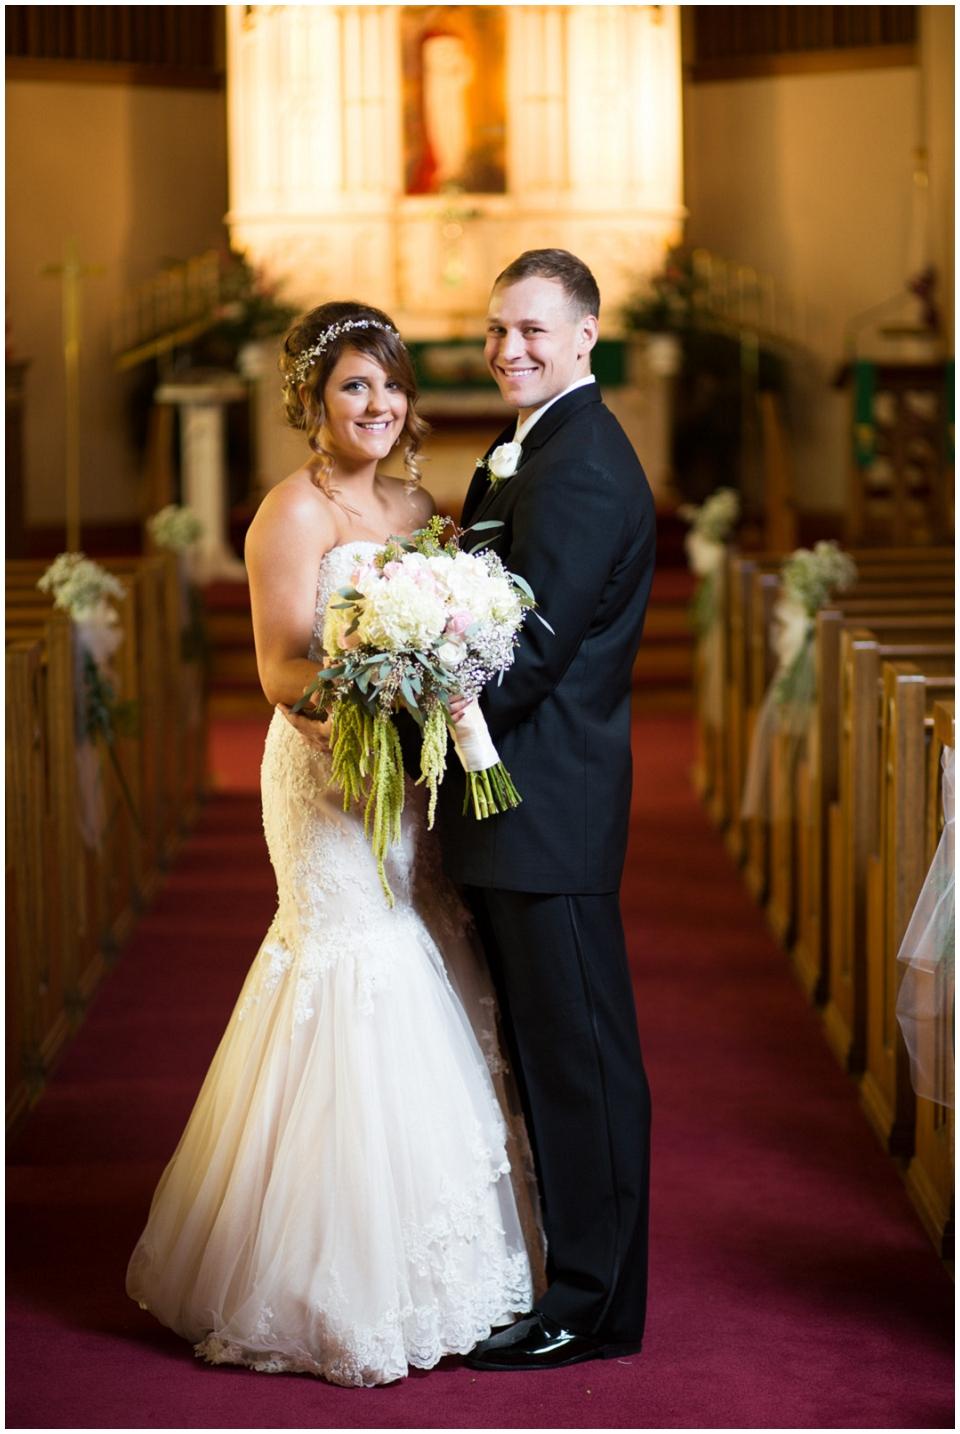 MackenzieJordan-Wedding-019.jpg